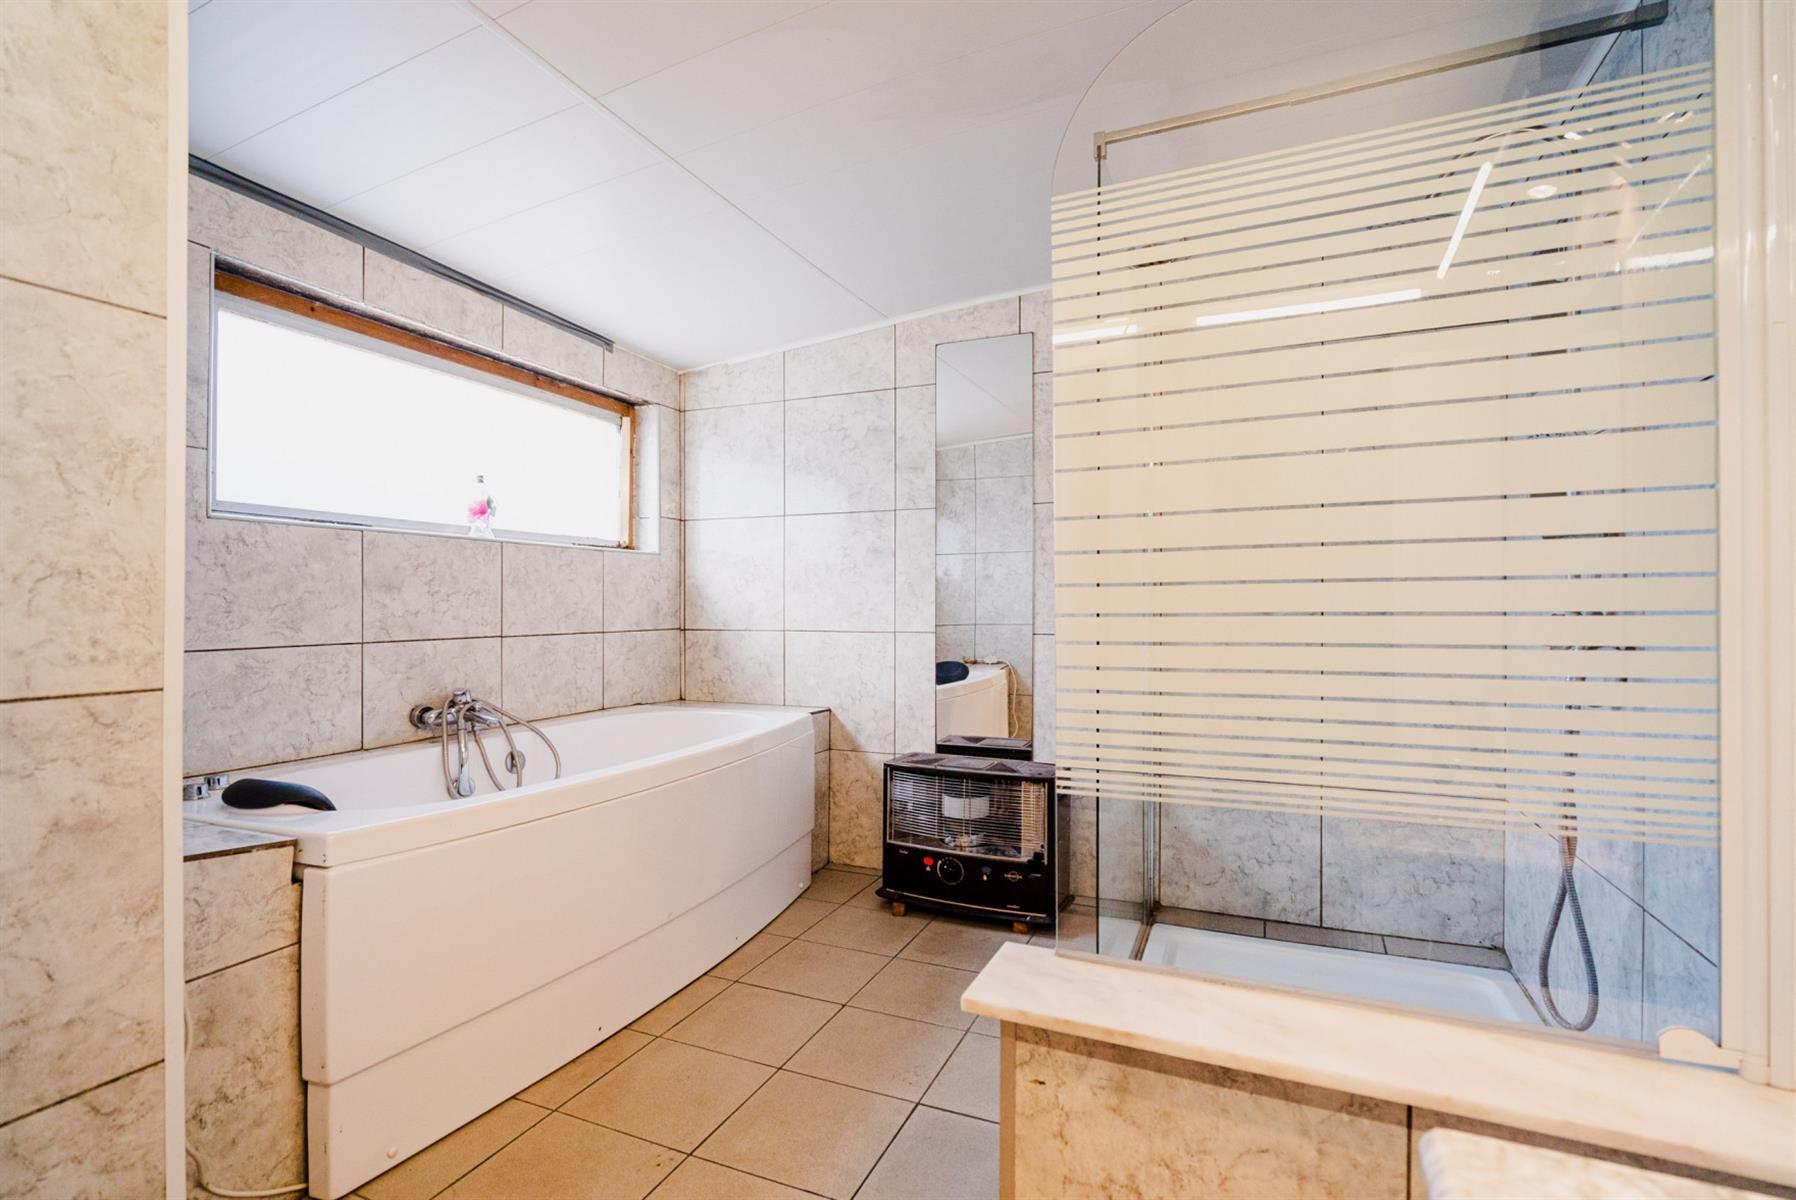 Maison - Oupeye Hermallesous-Argenteau - #4324098-7